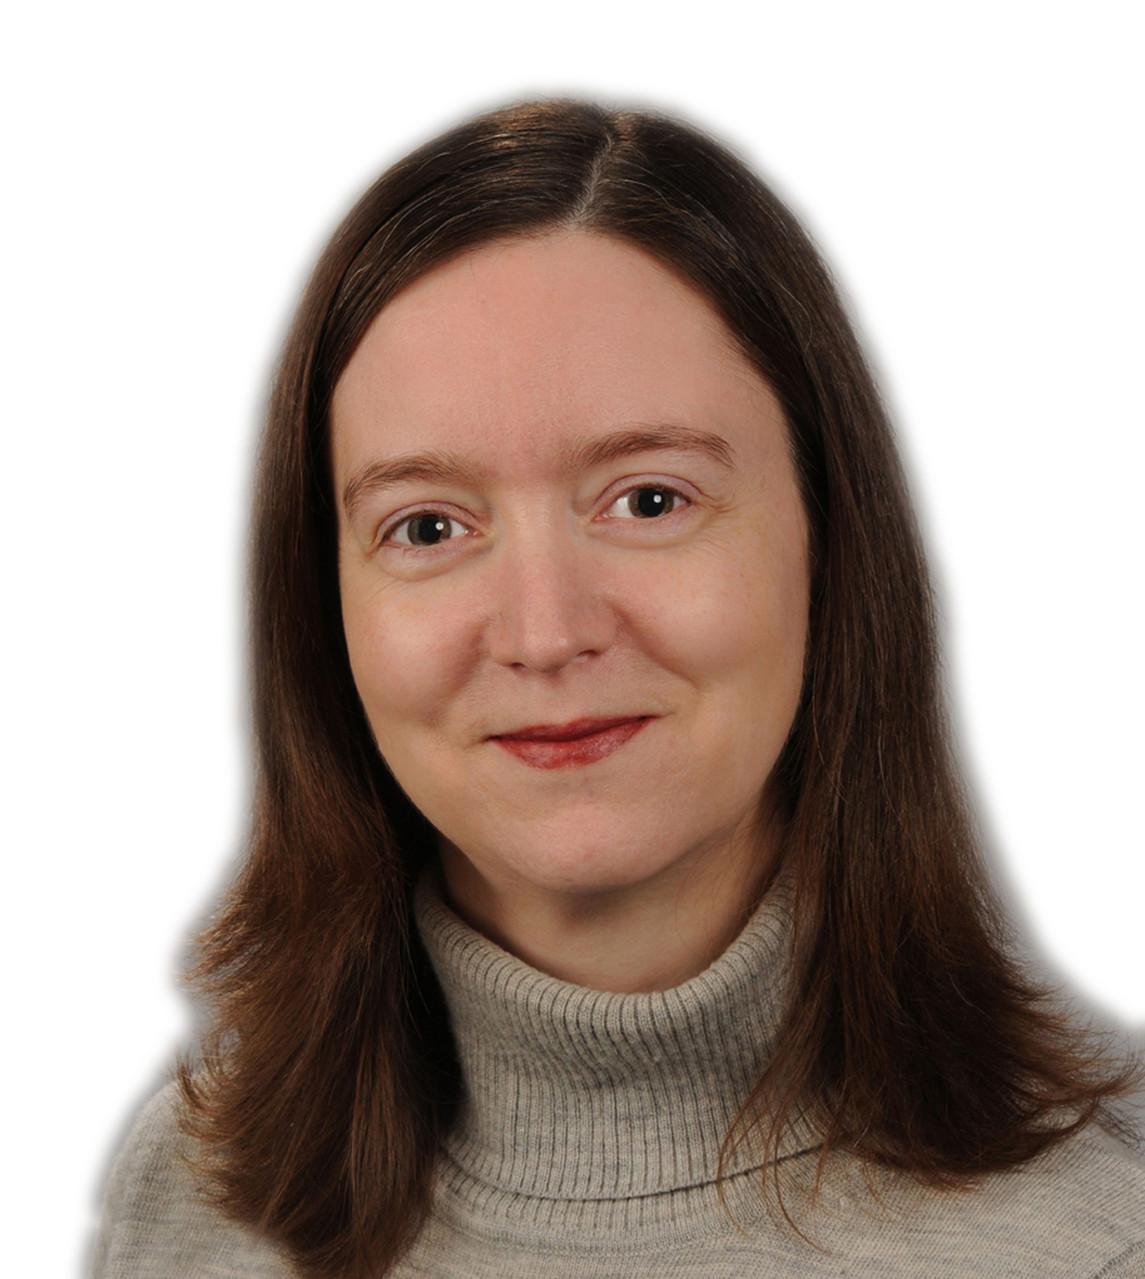 Ms. Ann-Louise Colgan Visited Apr 13